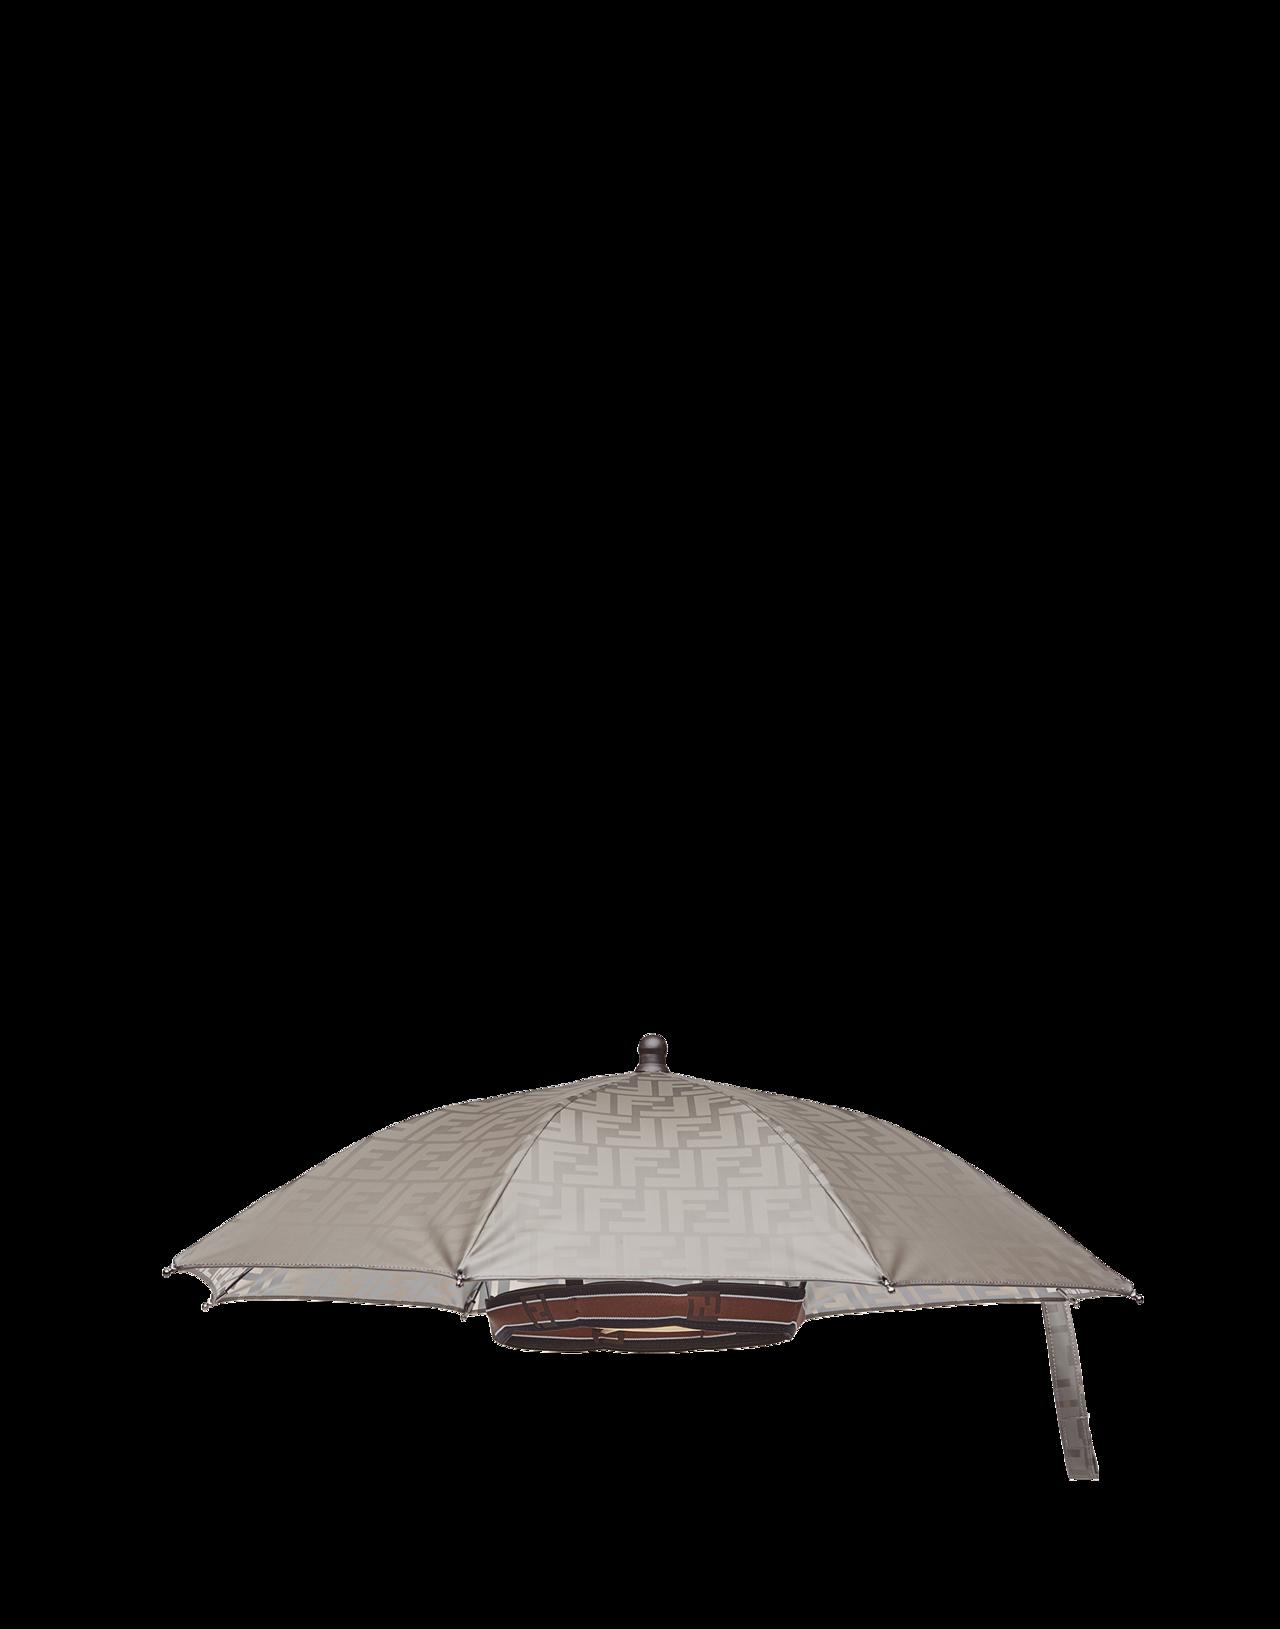 FENDI男士傘帽,11,500元。圖/FENDI提供